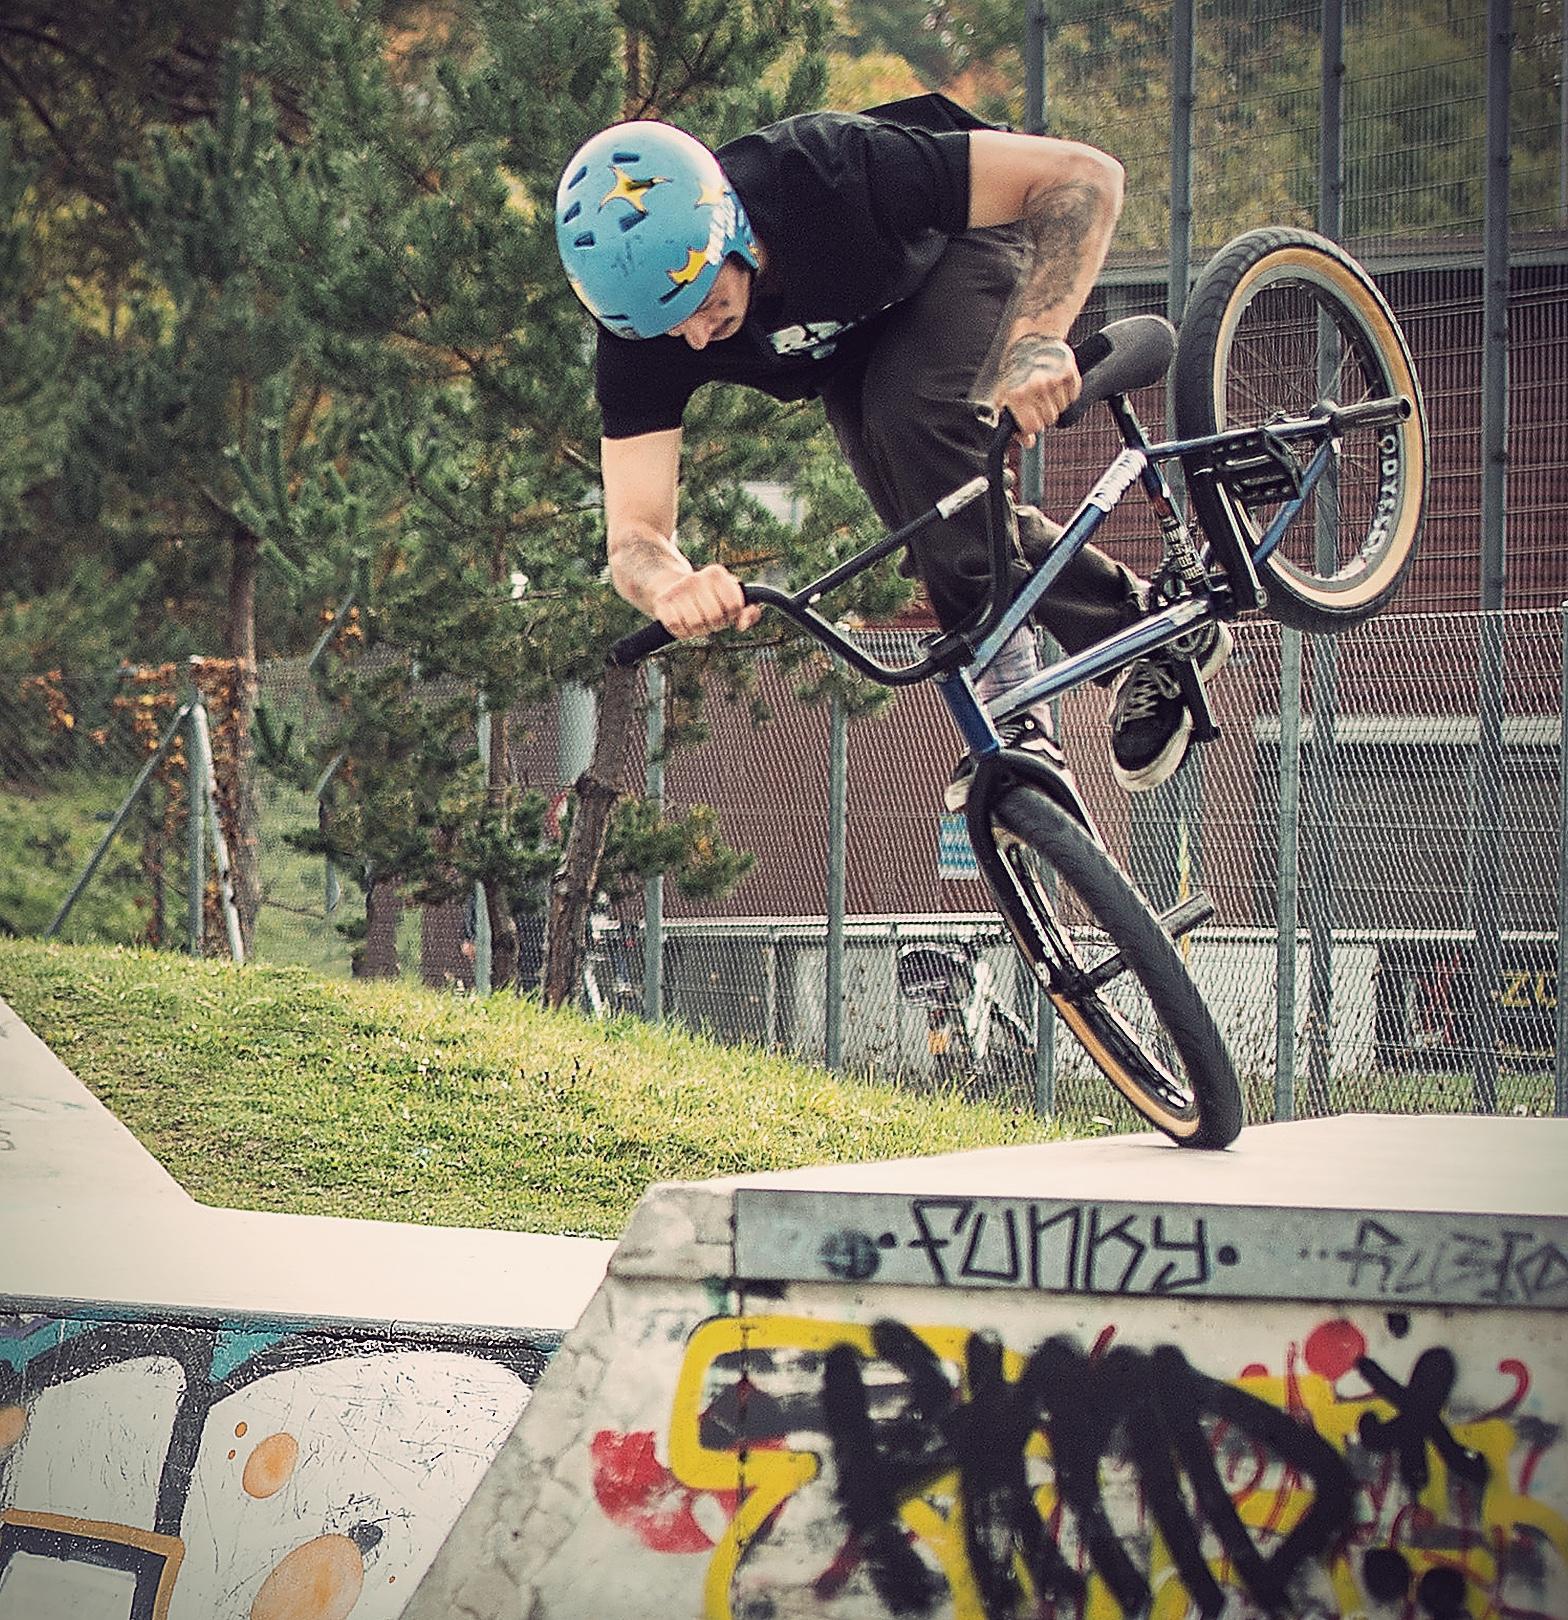 Bmx skatepark zurich Alessio tonoli